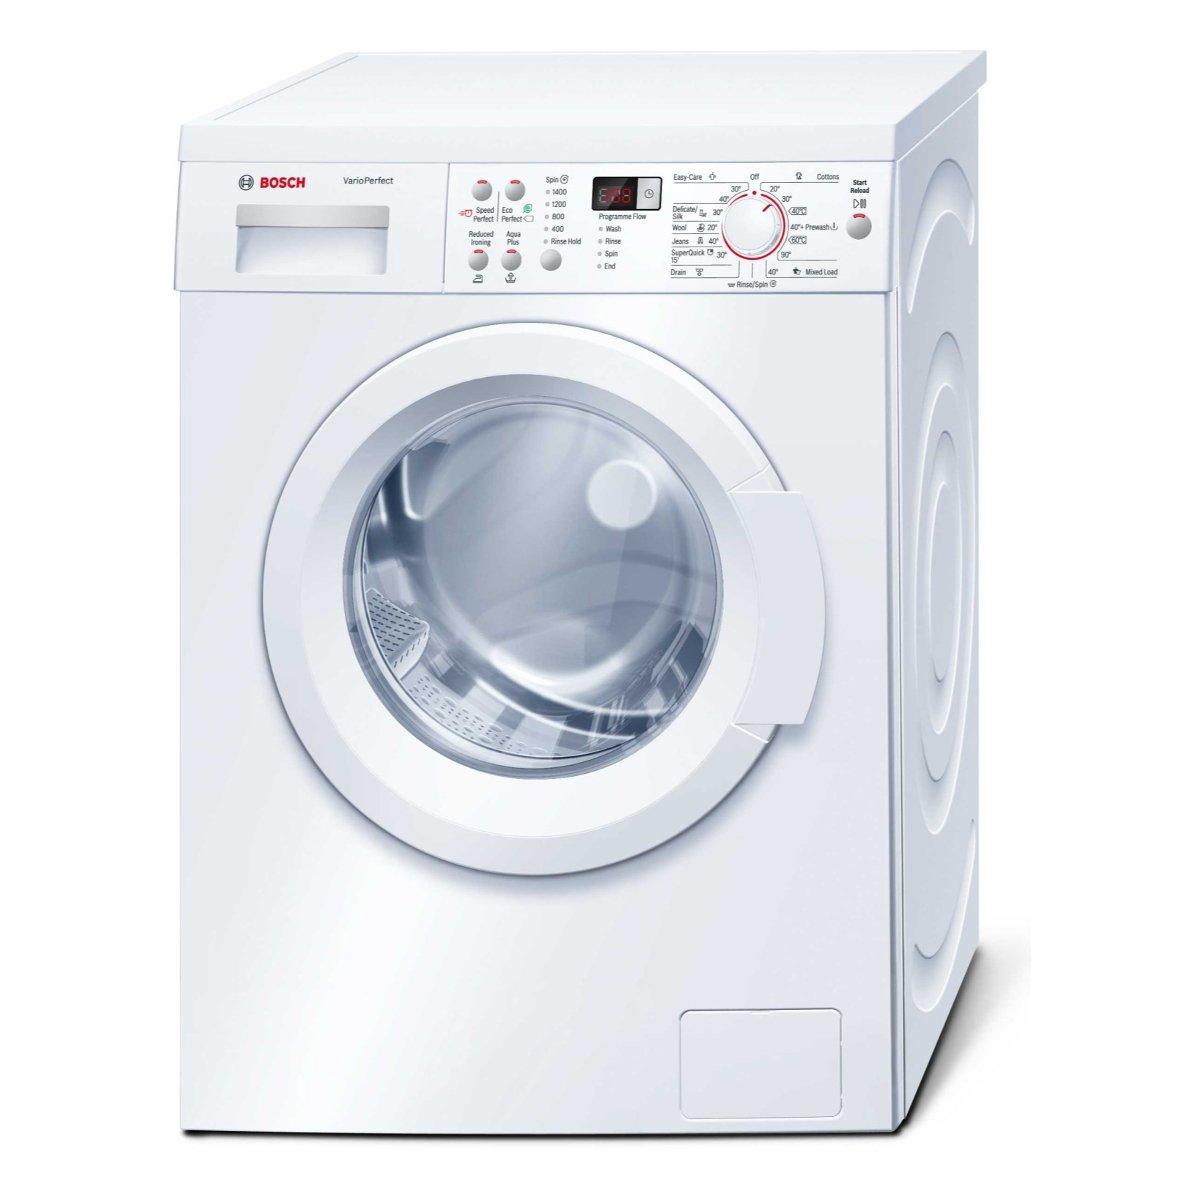 bosch waschmaschine waw285eco